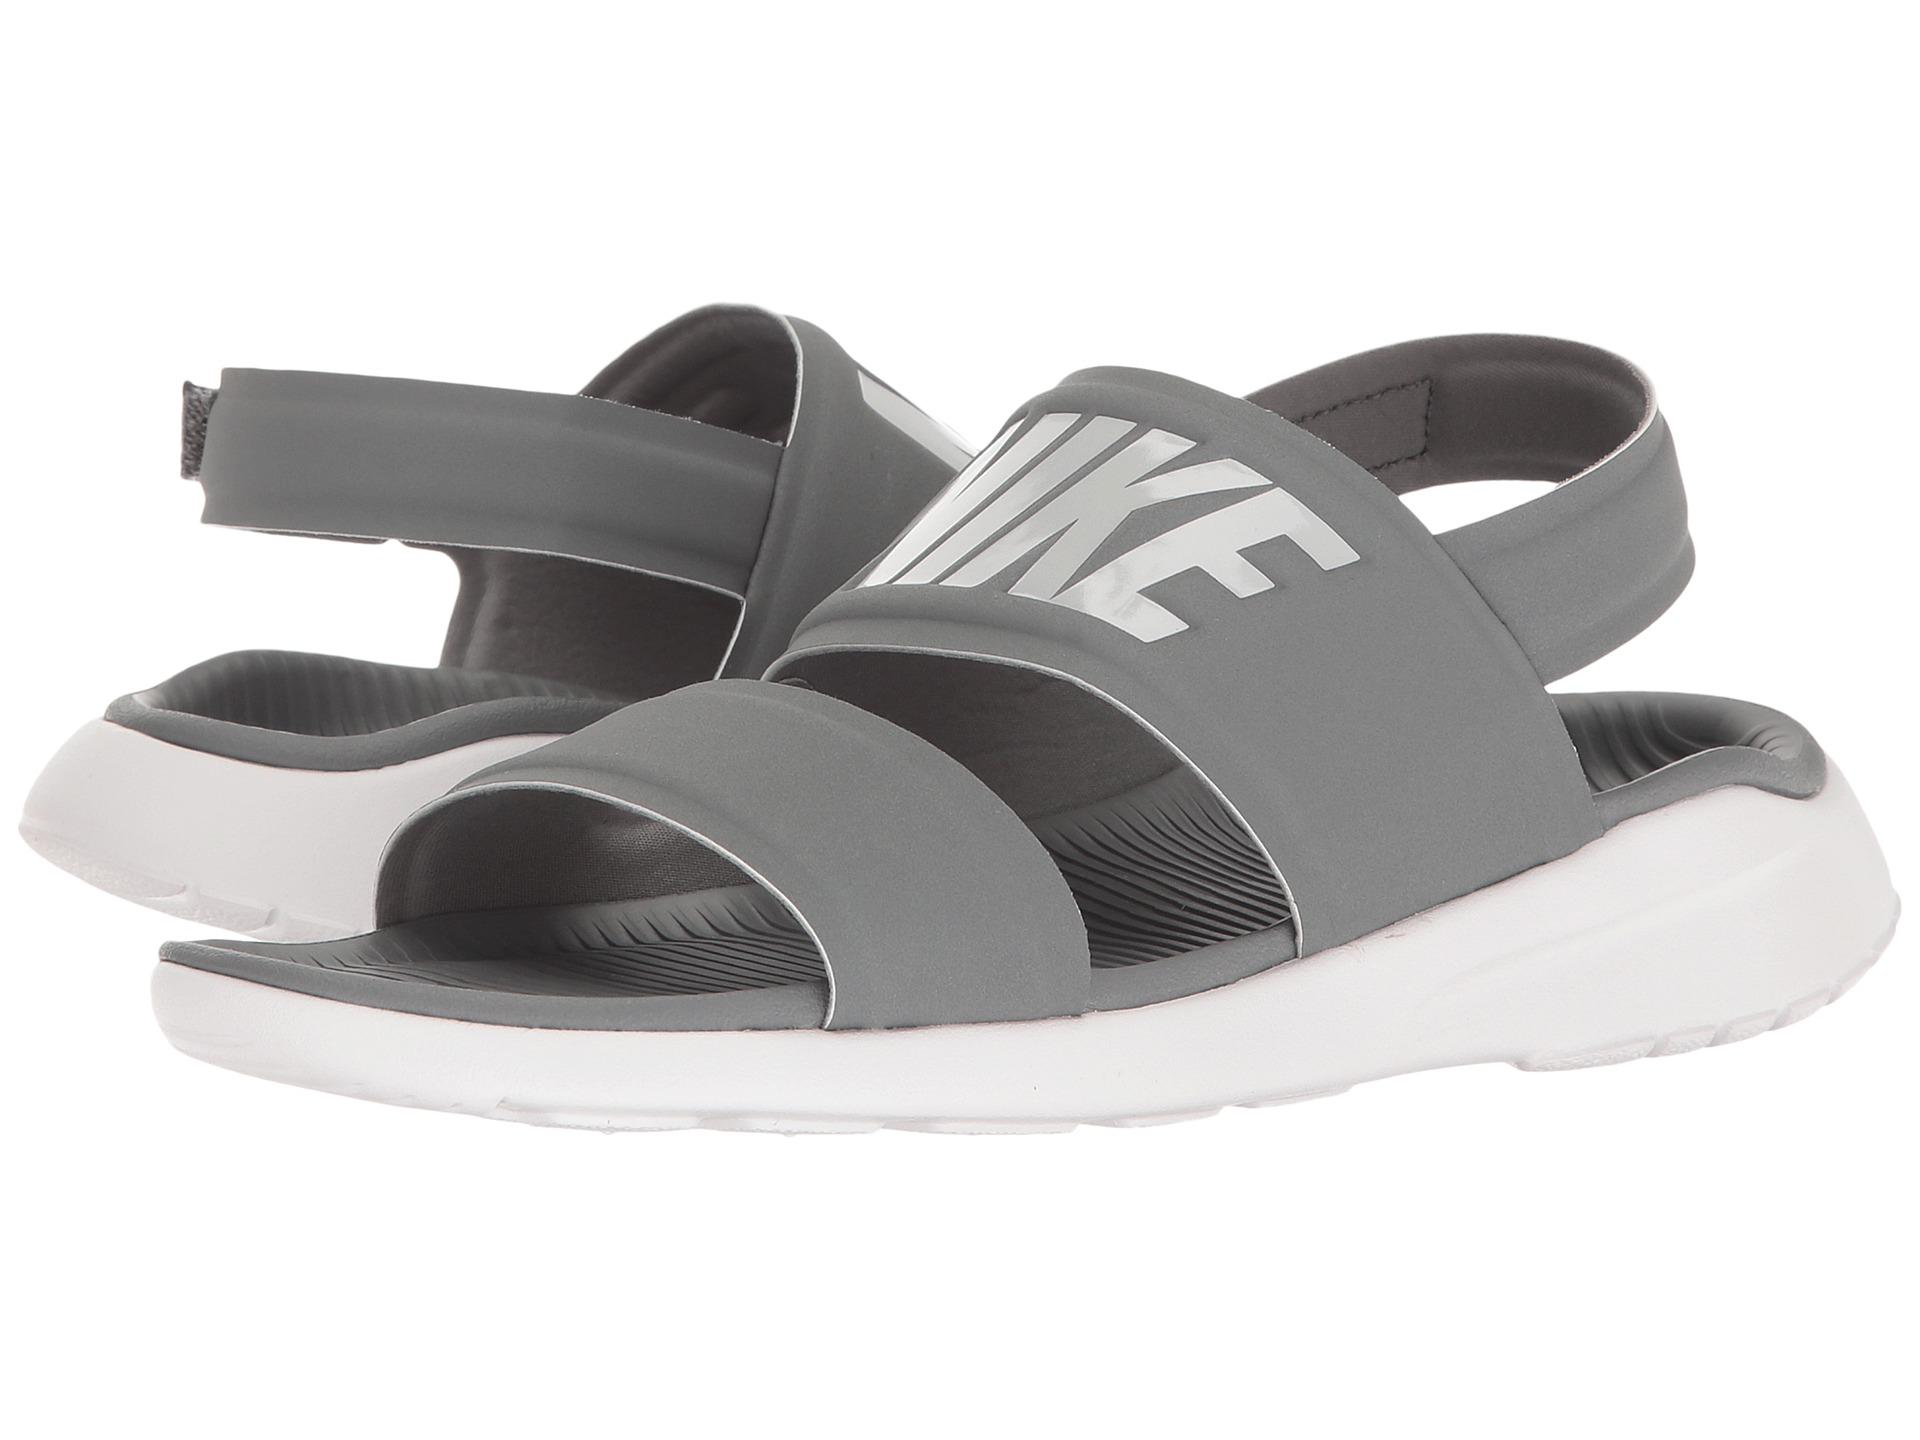 grey nike sandals #nike #shoes #nikeshoe #slides #sandals